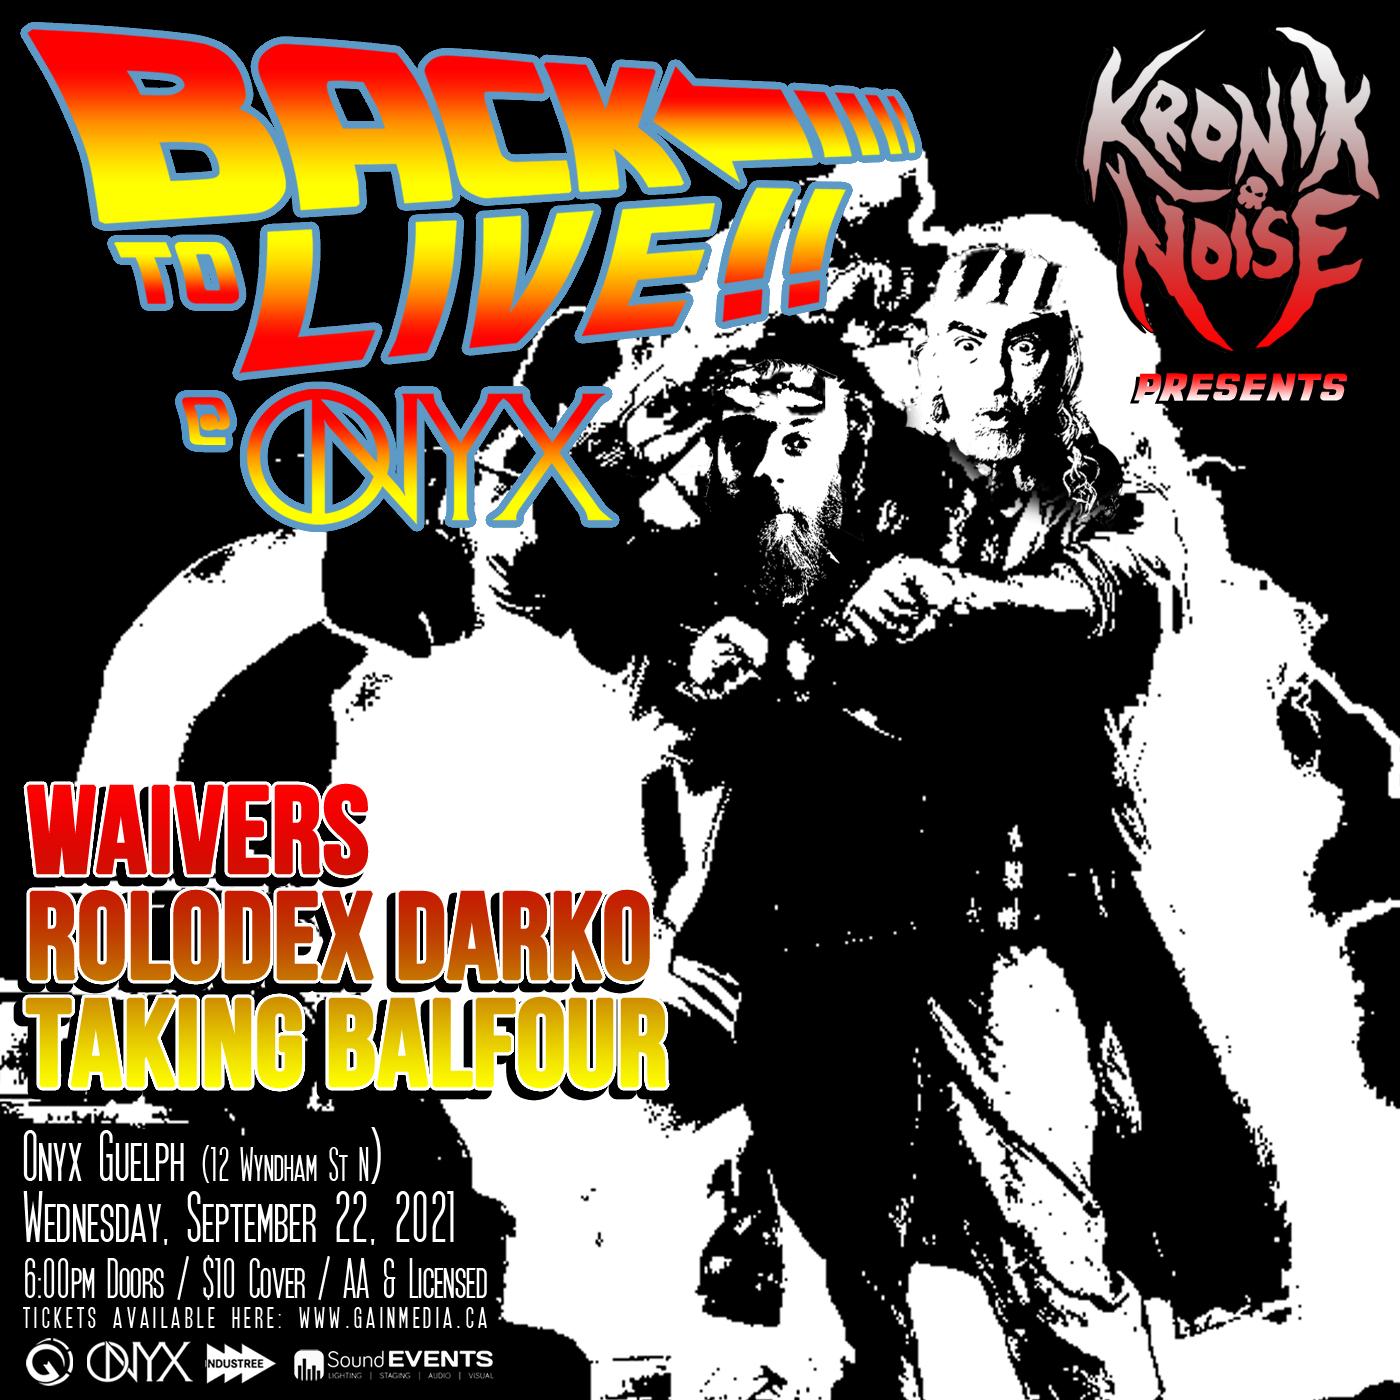 waiversmusic, rolodexdarko and taking balfour